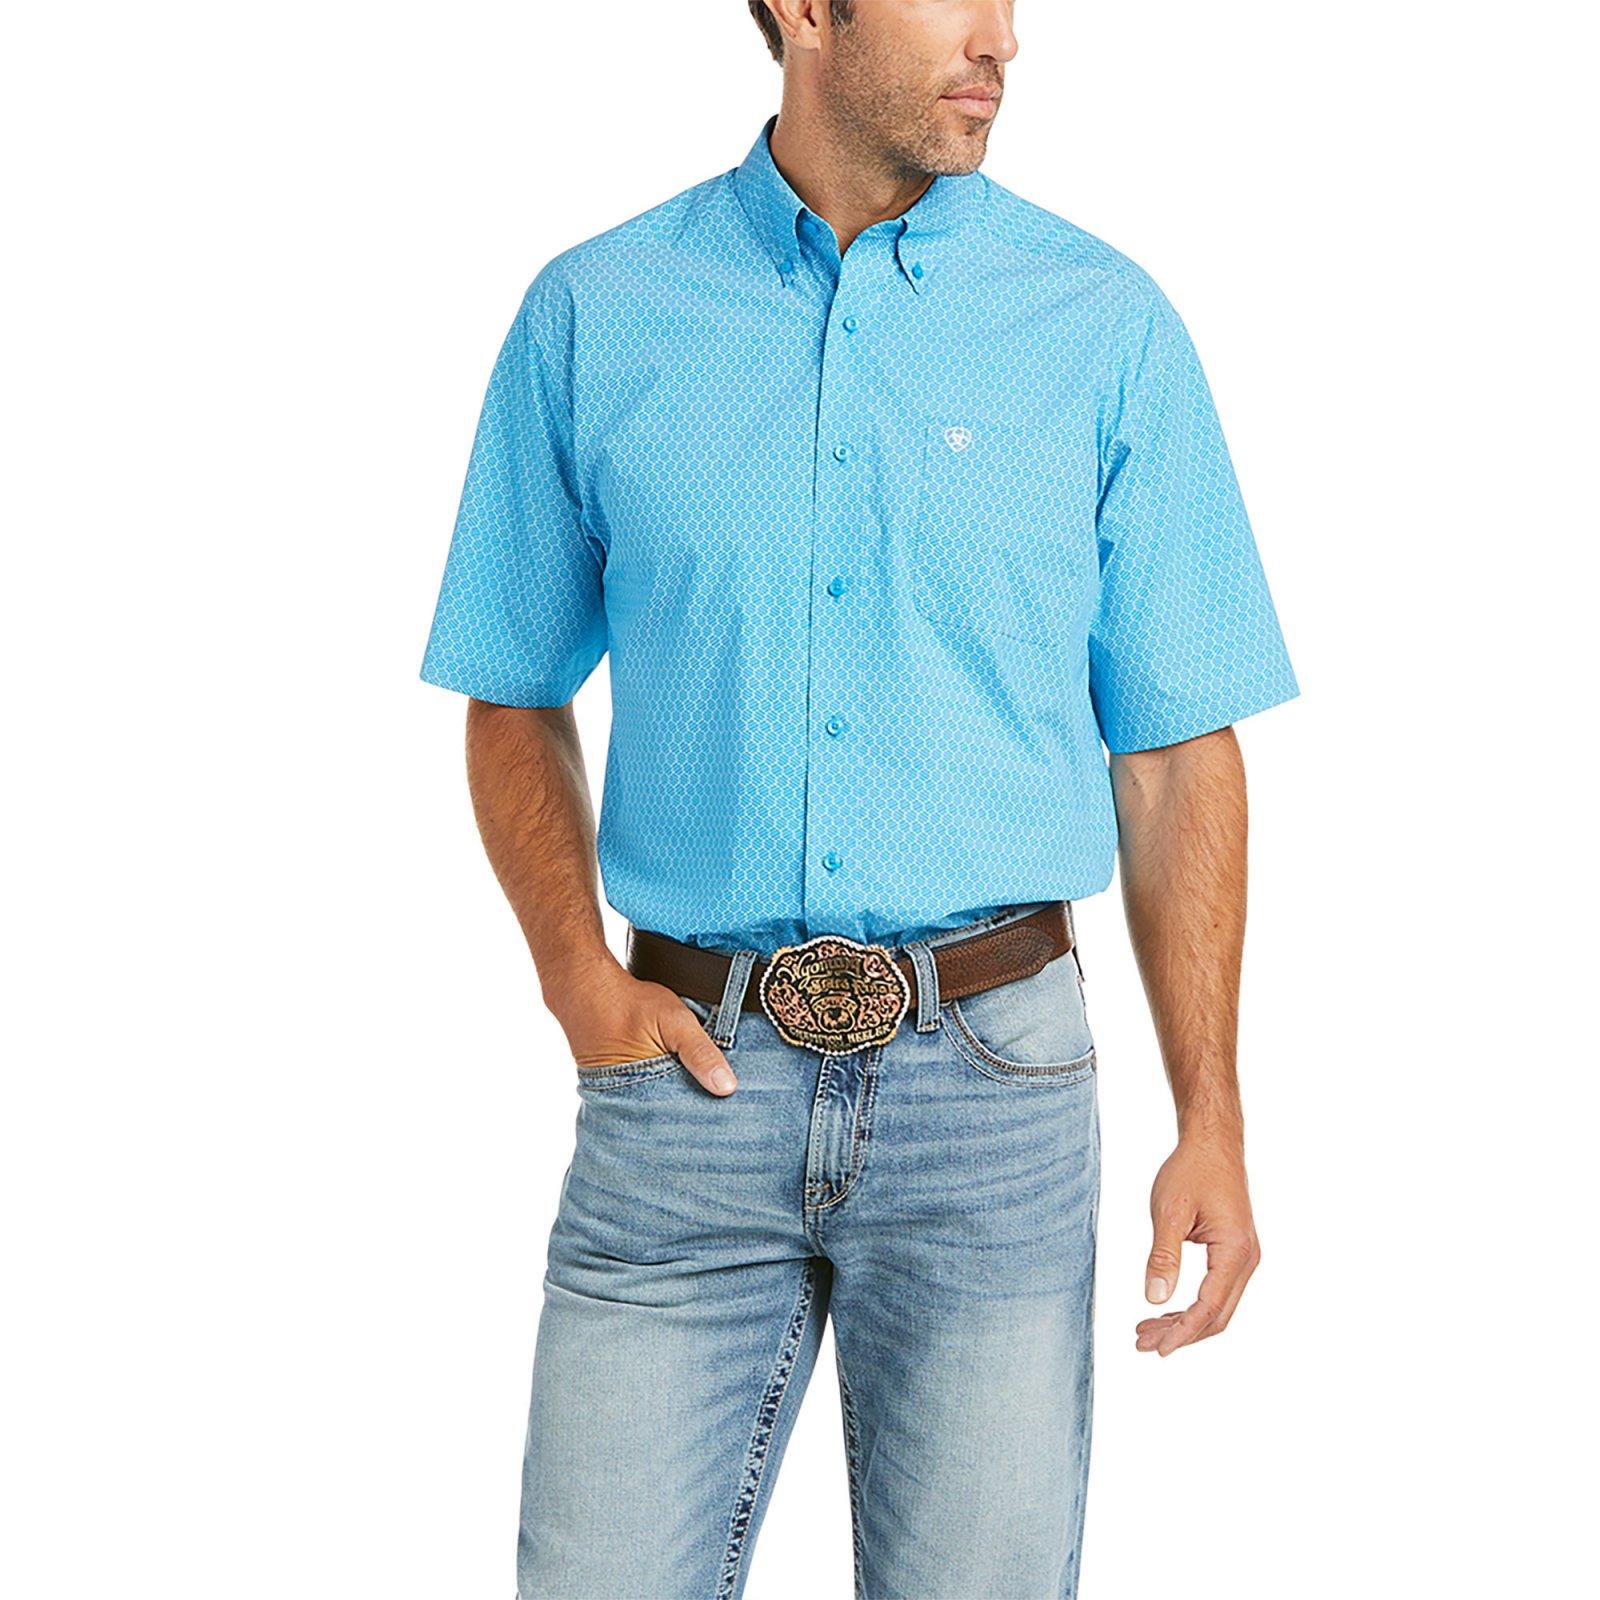 Casual Series Hampton Shirt from Ariat